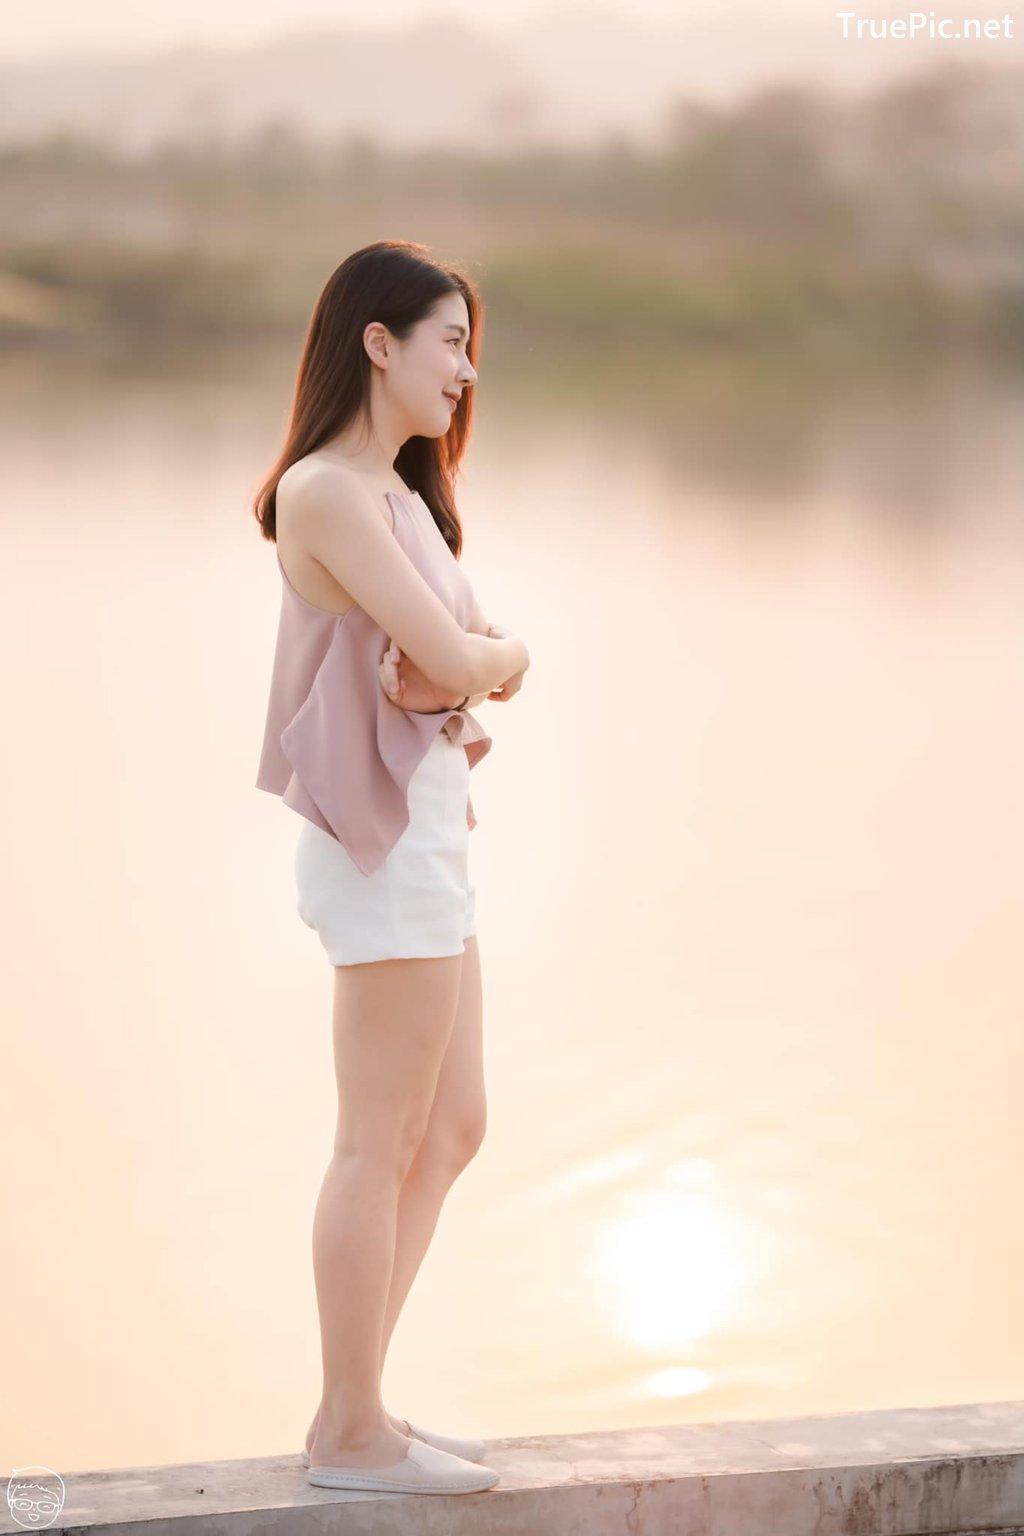 Image Thailand Model - Namlom Homhuan - Sweet Pink - TruePic.net - Picture-8